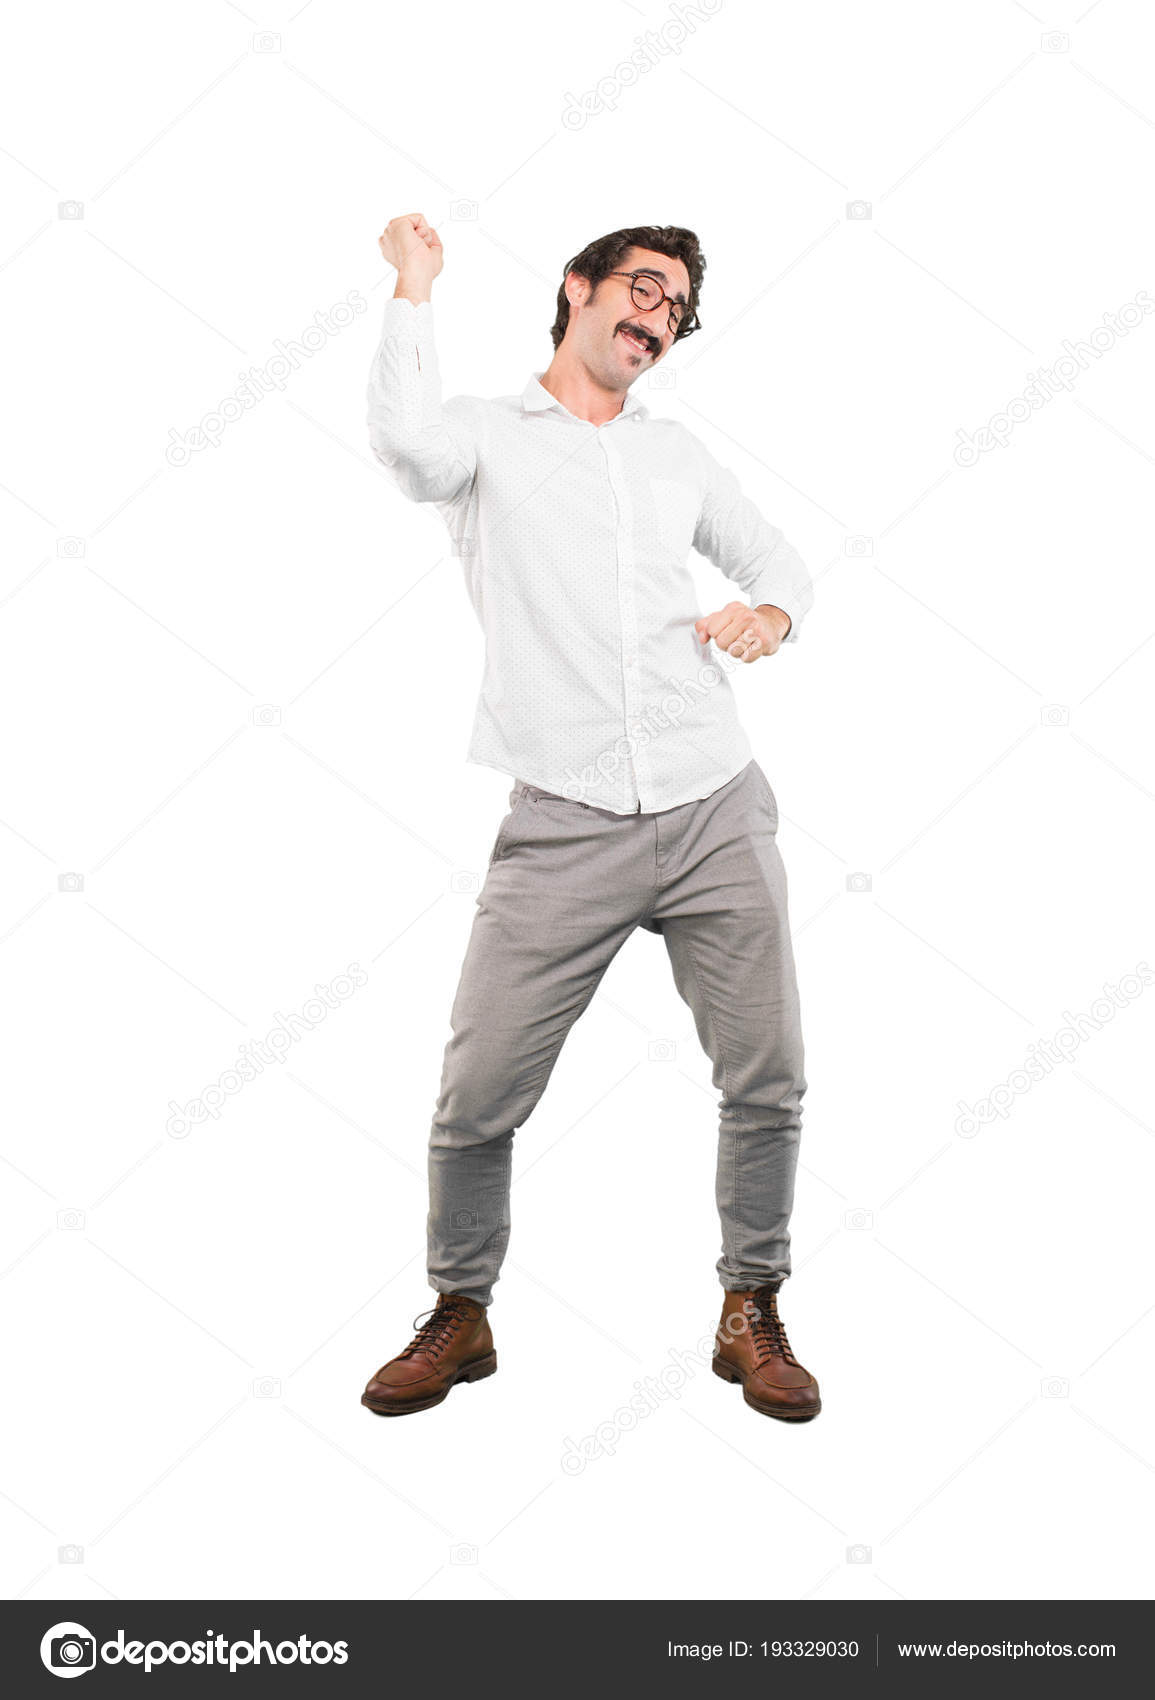 1 Persona Cuerpo Completo Joven Loco Bailando Persona Recorte